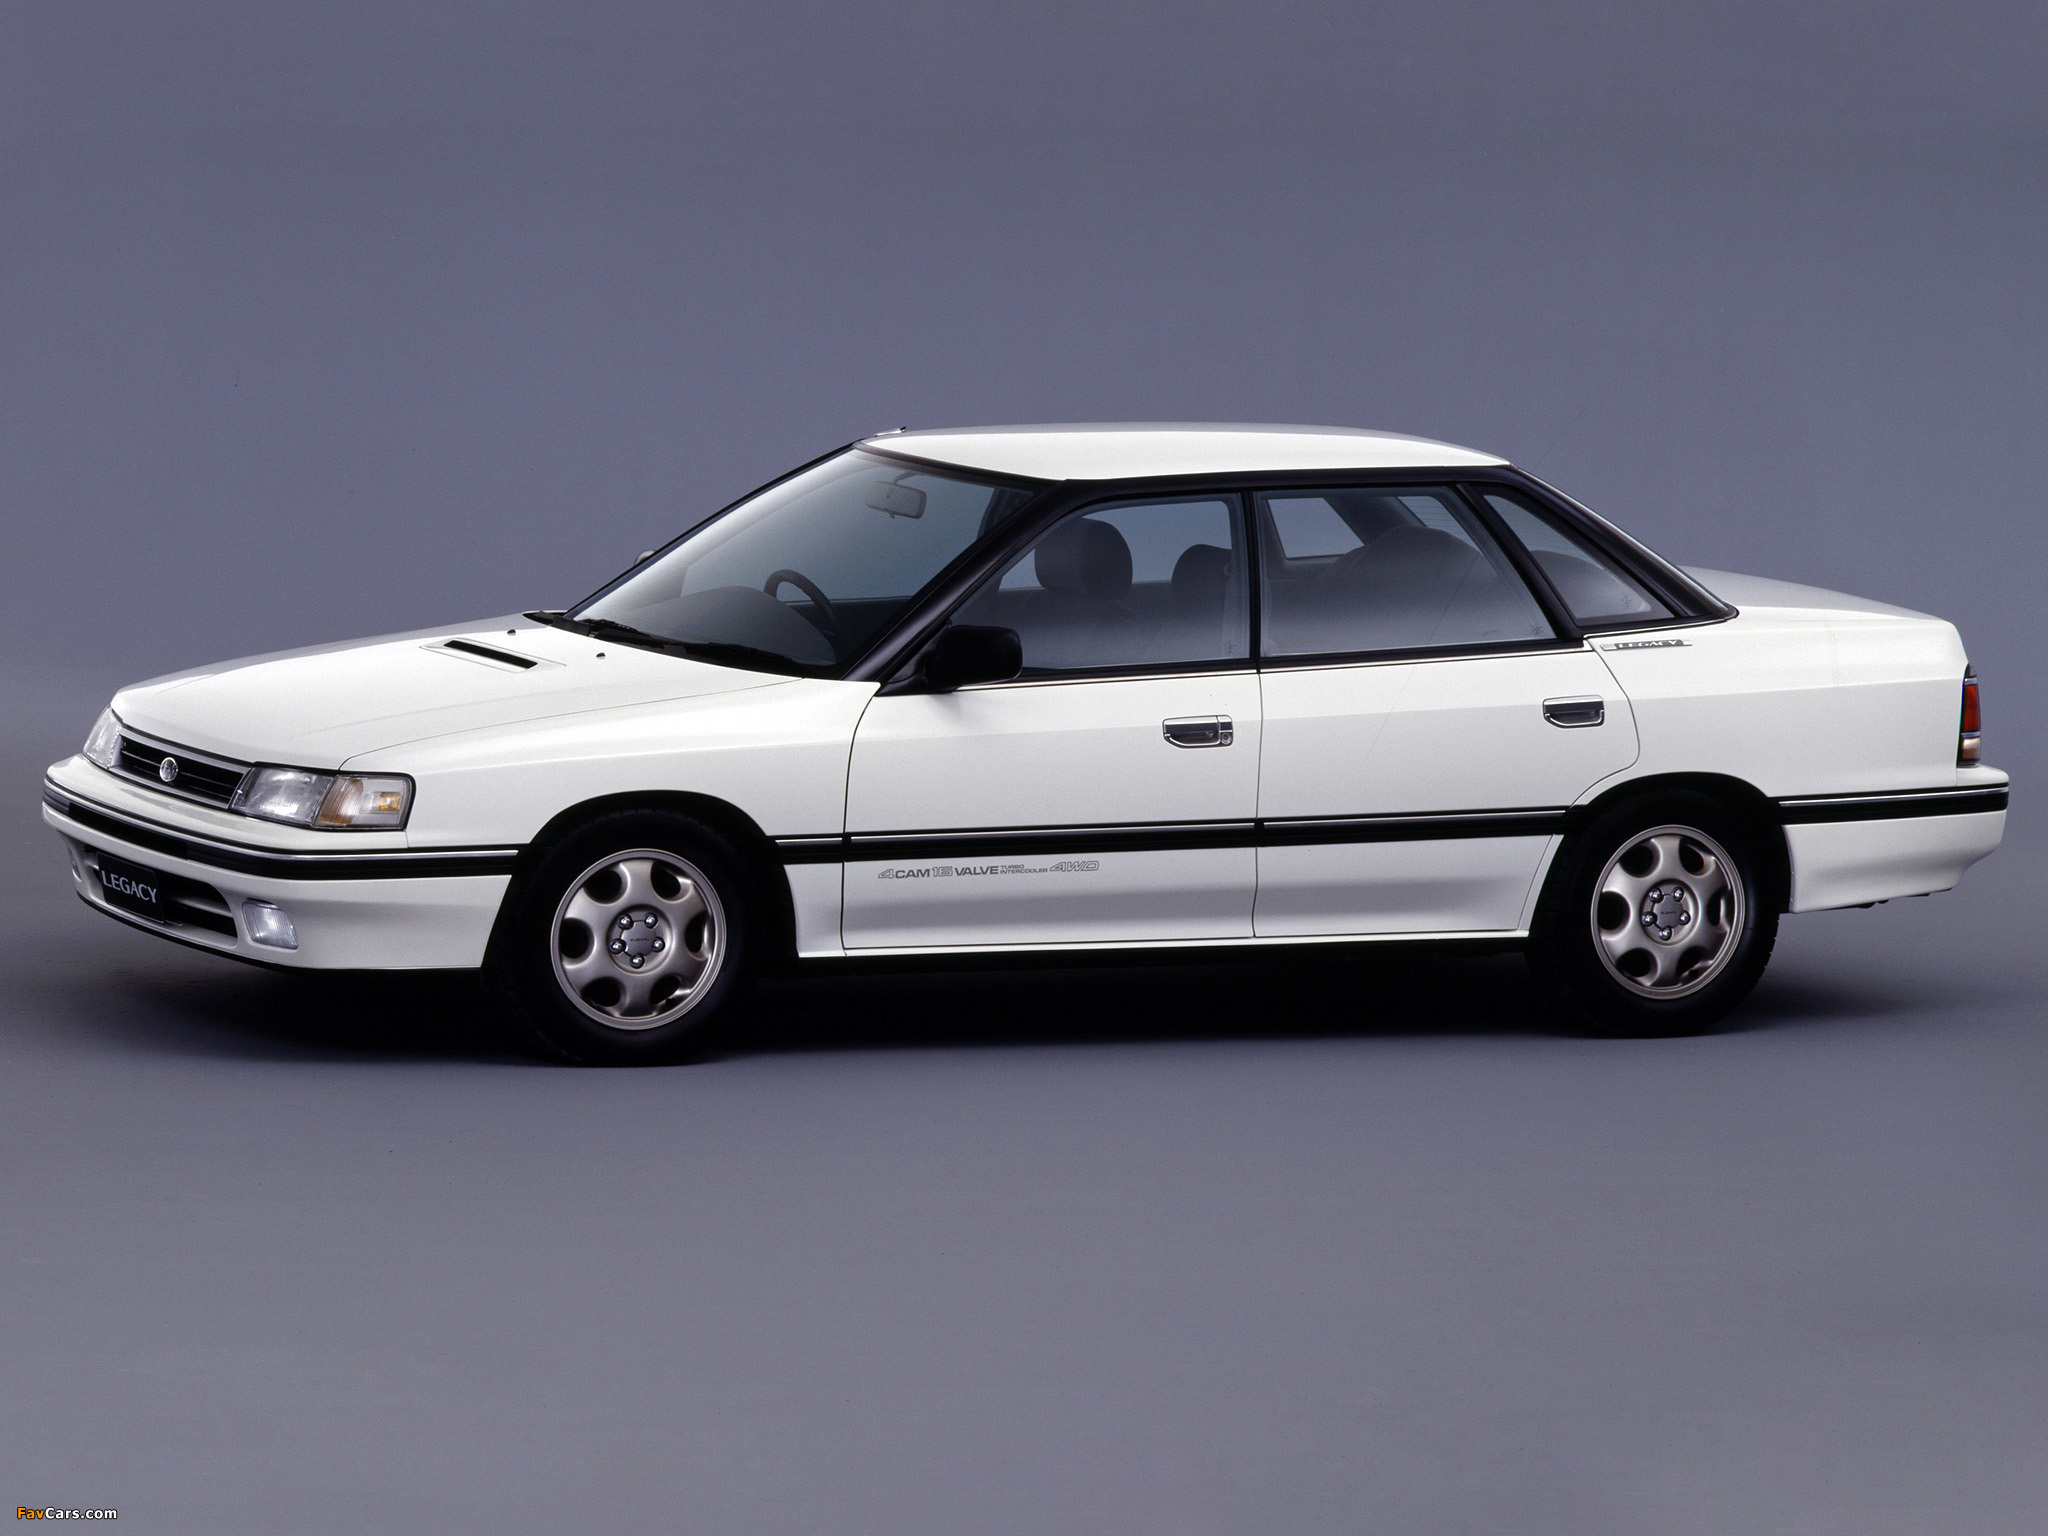 http://img.favcars.com/subaru/legacy/images_subaru_legacy_1989_1.jpg